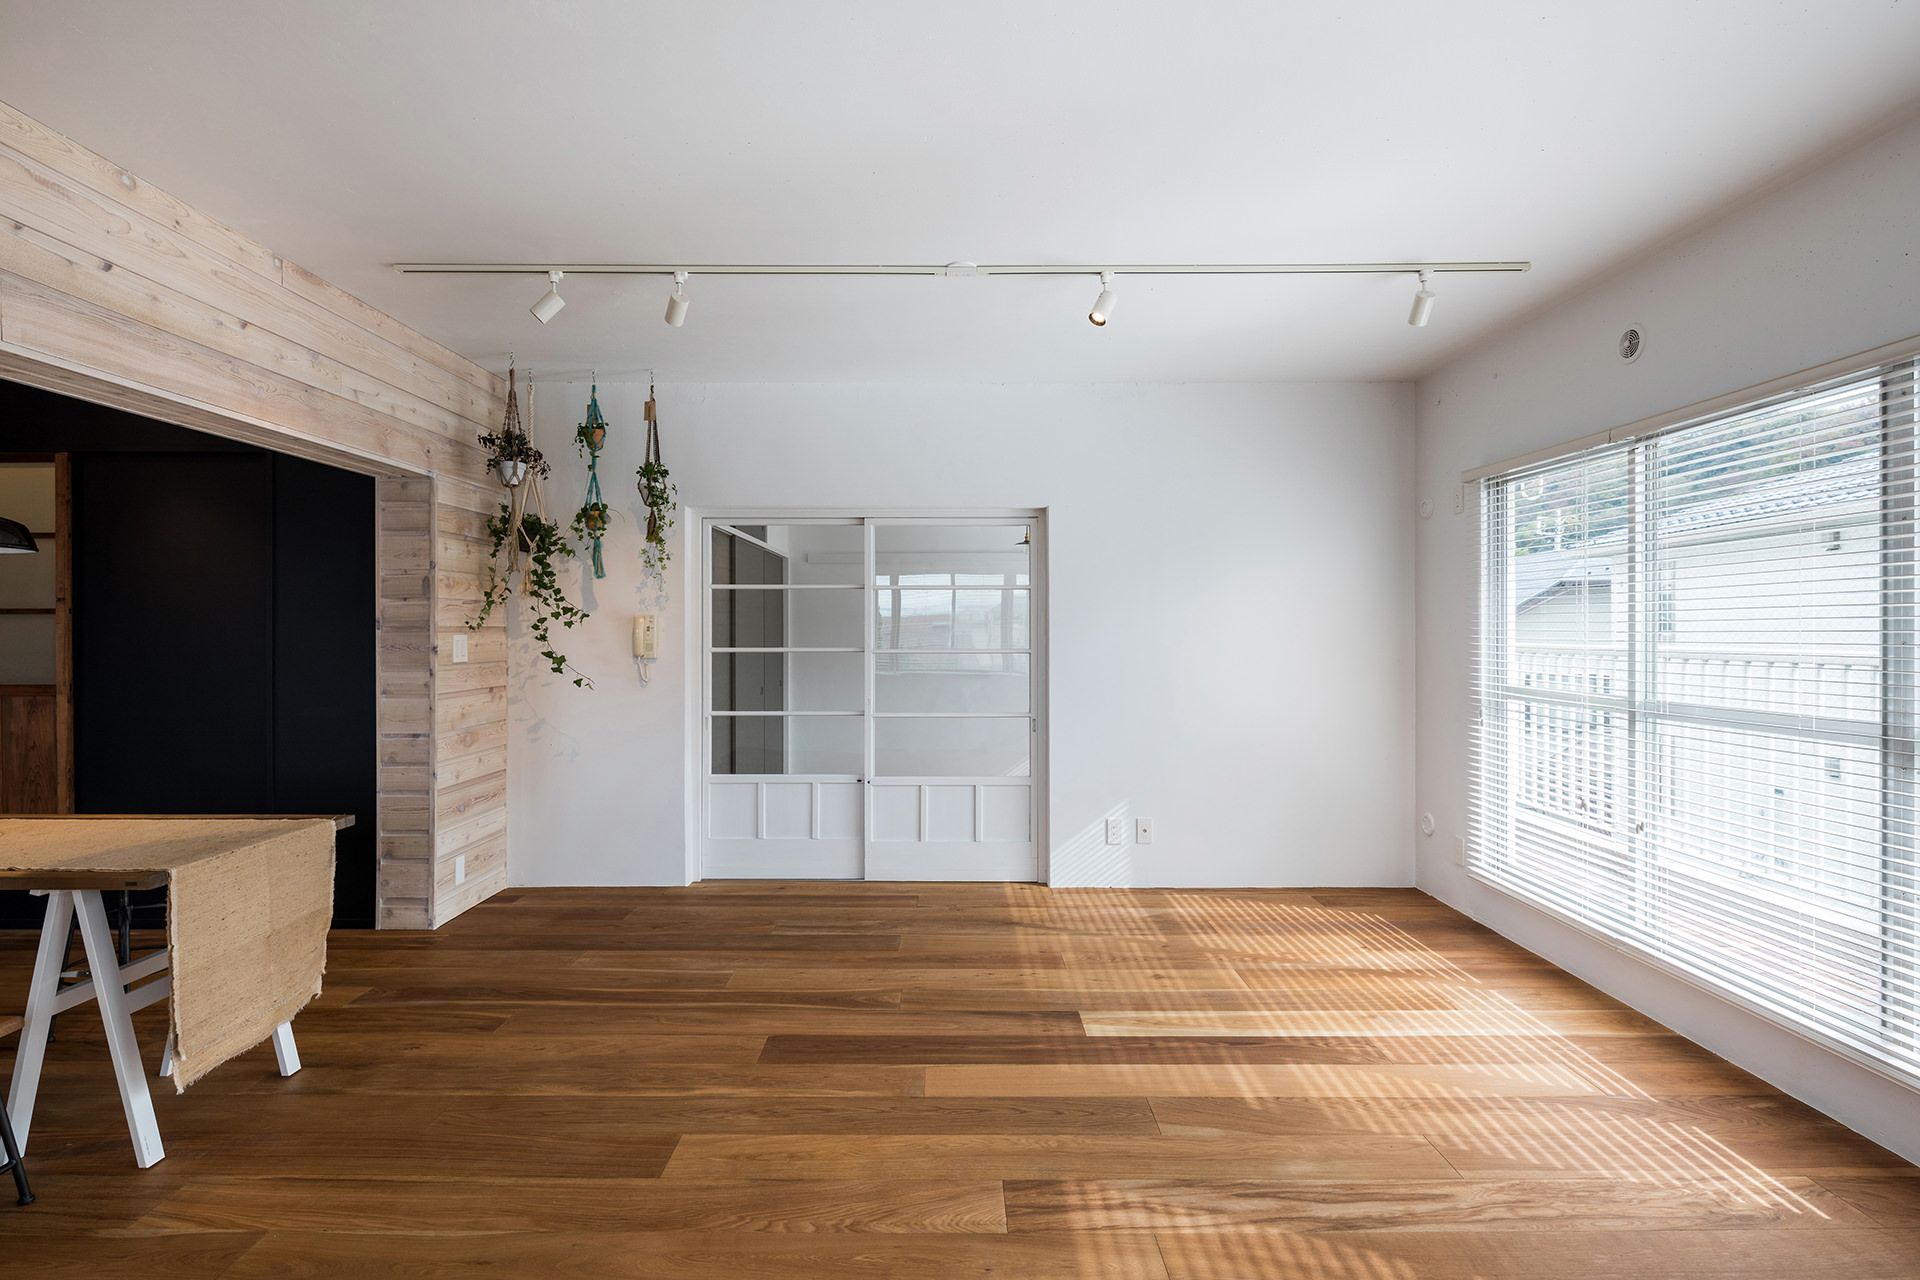 「stri-ep house flat ジュネス葉山一色ガーデン」  イメージ09 撮影:東涌宏和